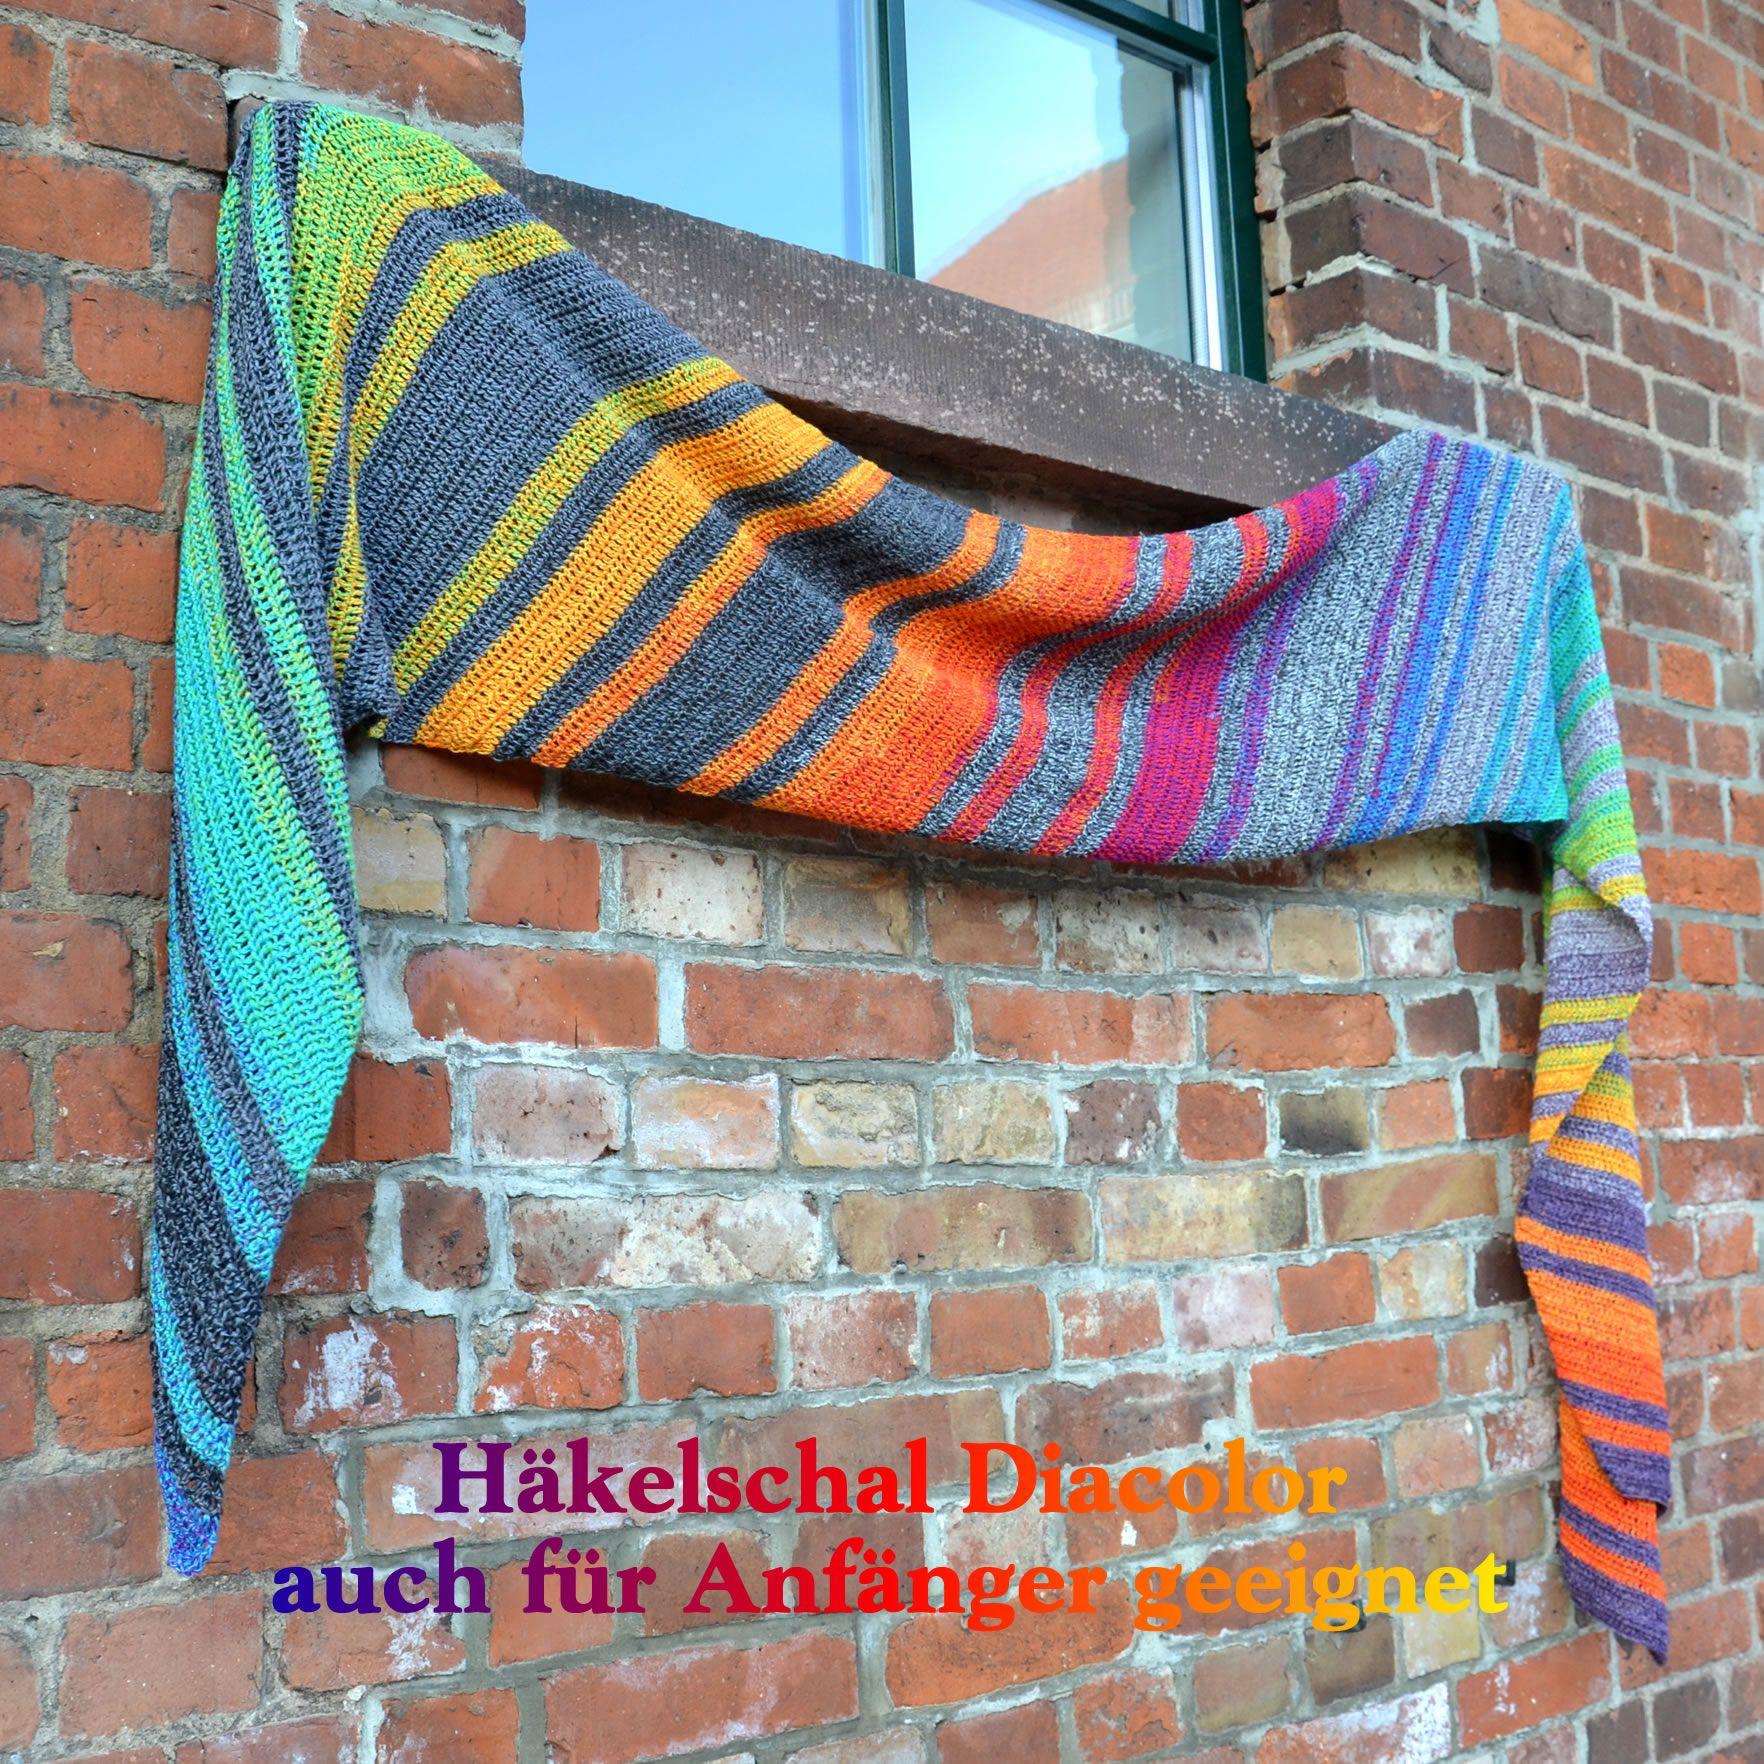 Häkel- & StrickSet inkl. PDF Anleitung LoLa 4fach Bobbel Maxi-Schal Diacolor #hatflower